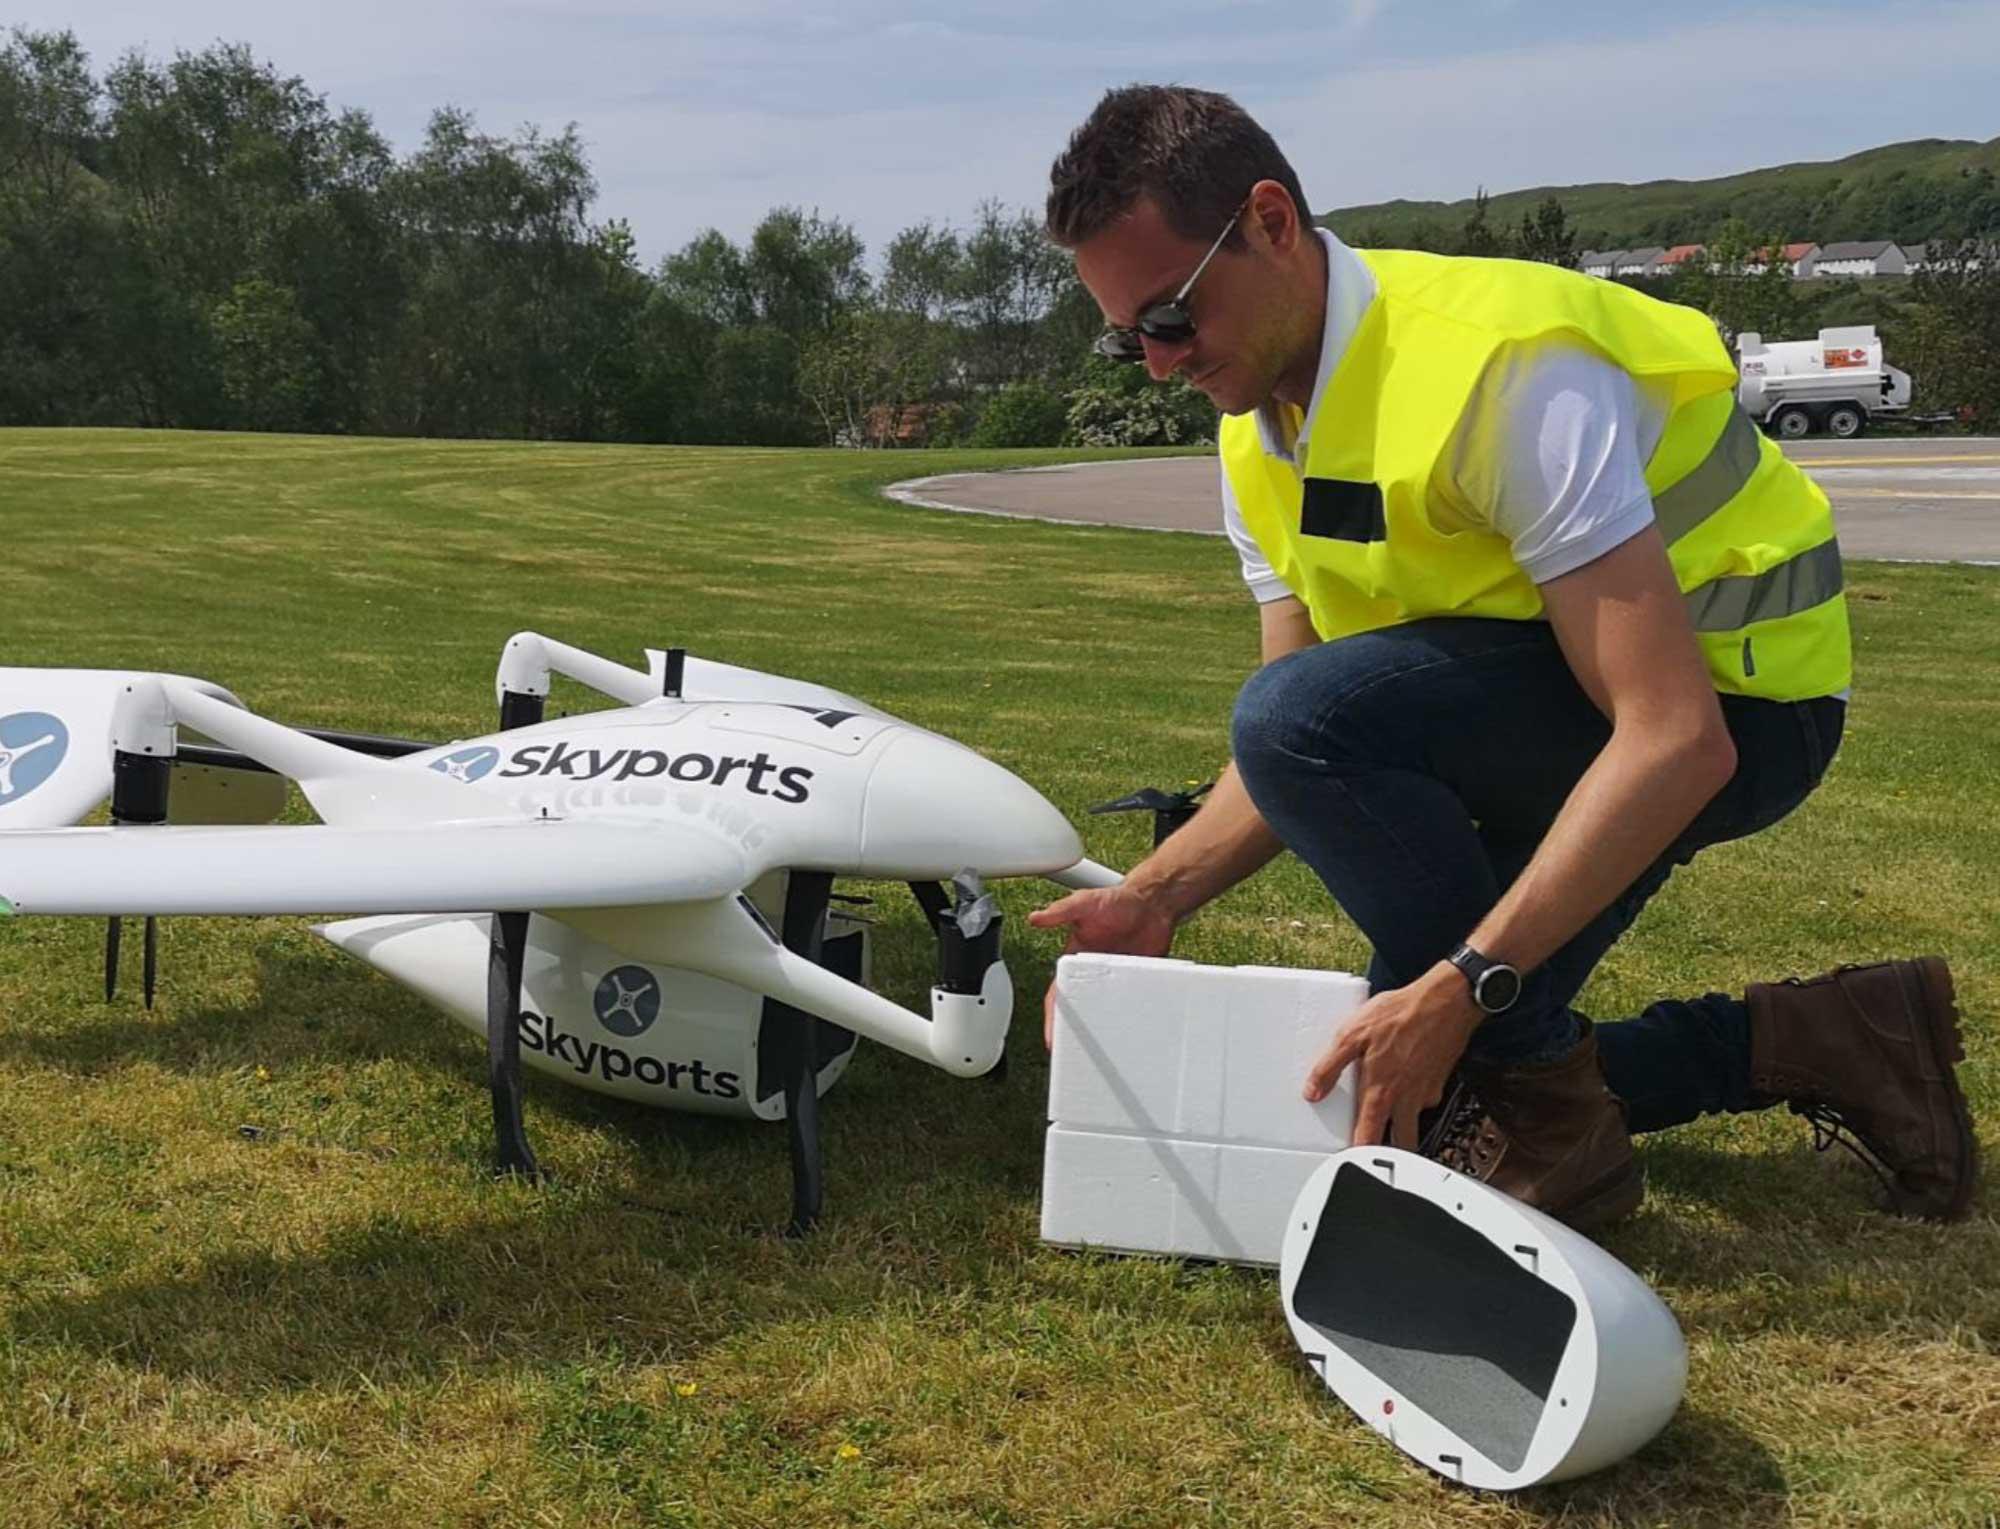 Skyports drone operator